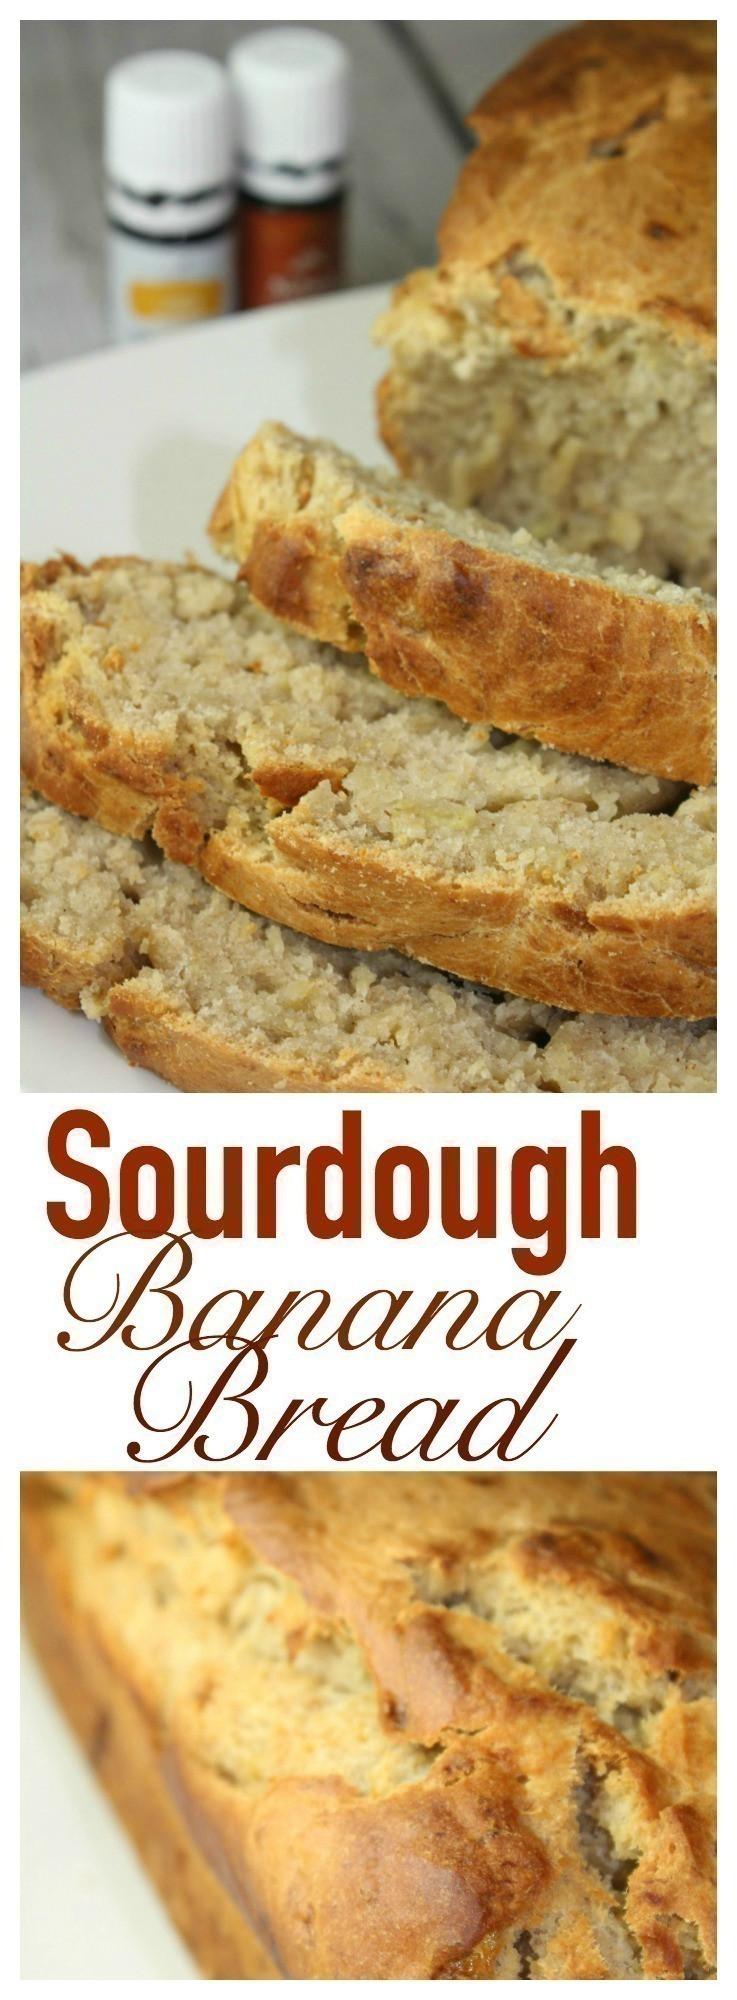 Sourdough Banana Bread  Sourdough Banana Bread